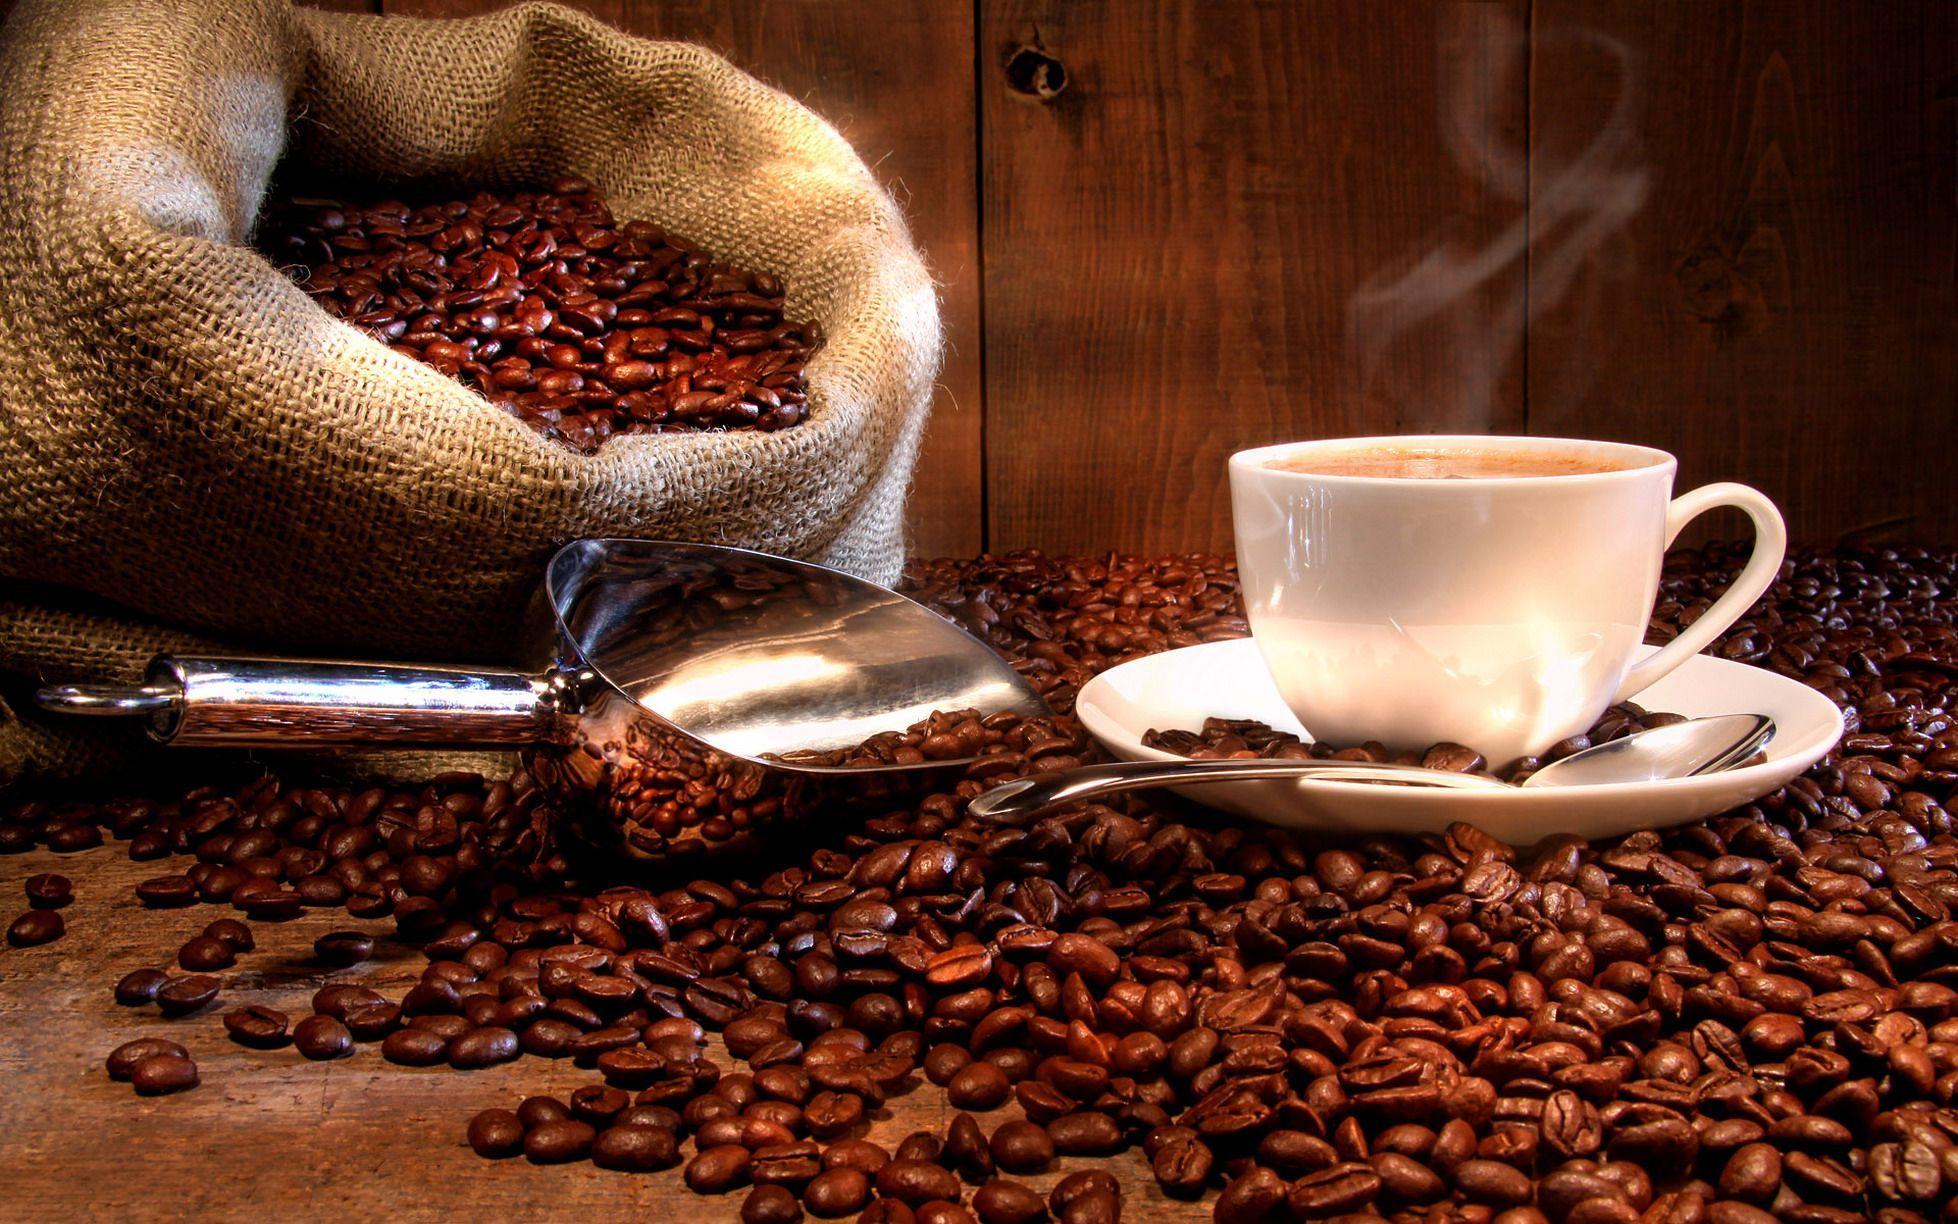 I 6 motivi per cui bere il caffè